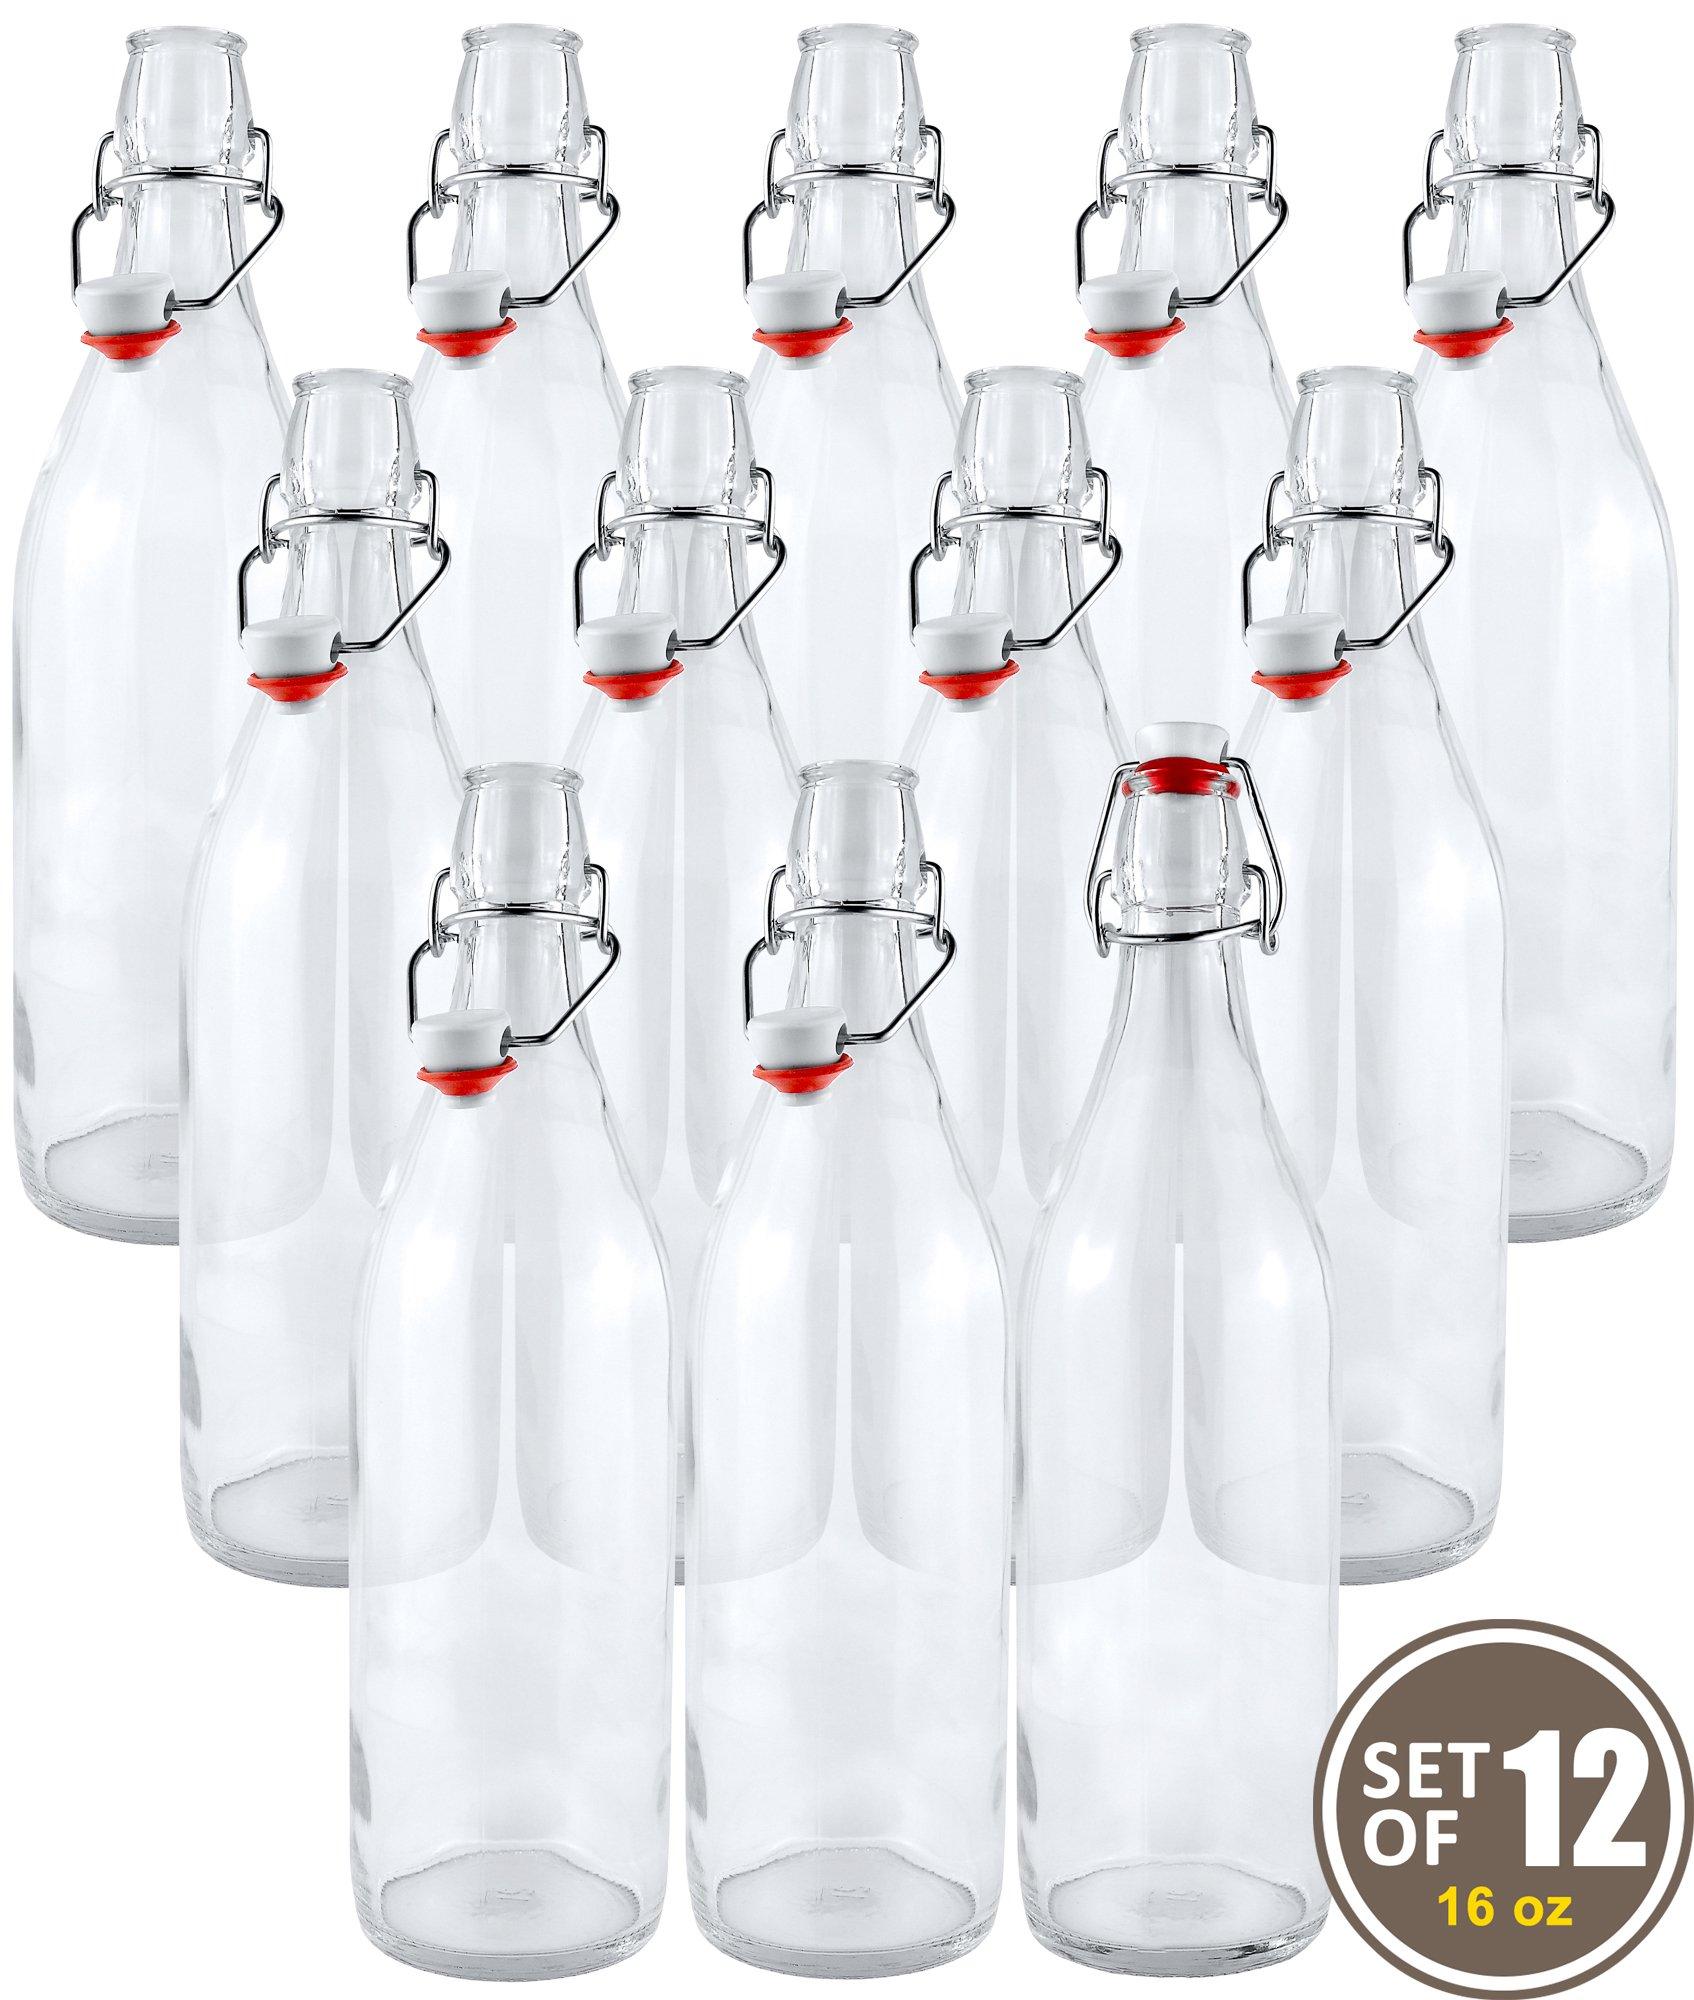 Estilo Swing Top Easy Cap Clear Glass Beer Bottles, Round, 16 oz, Set of 12 by Estilo